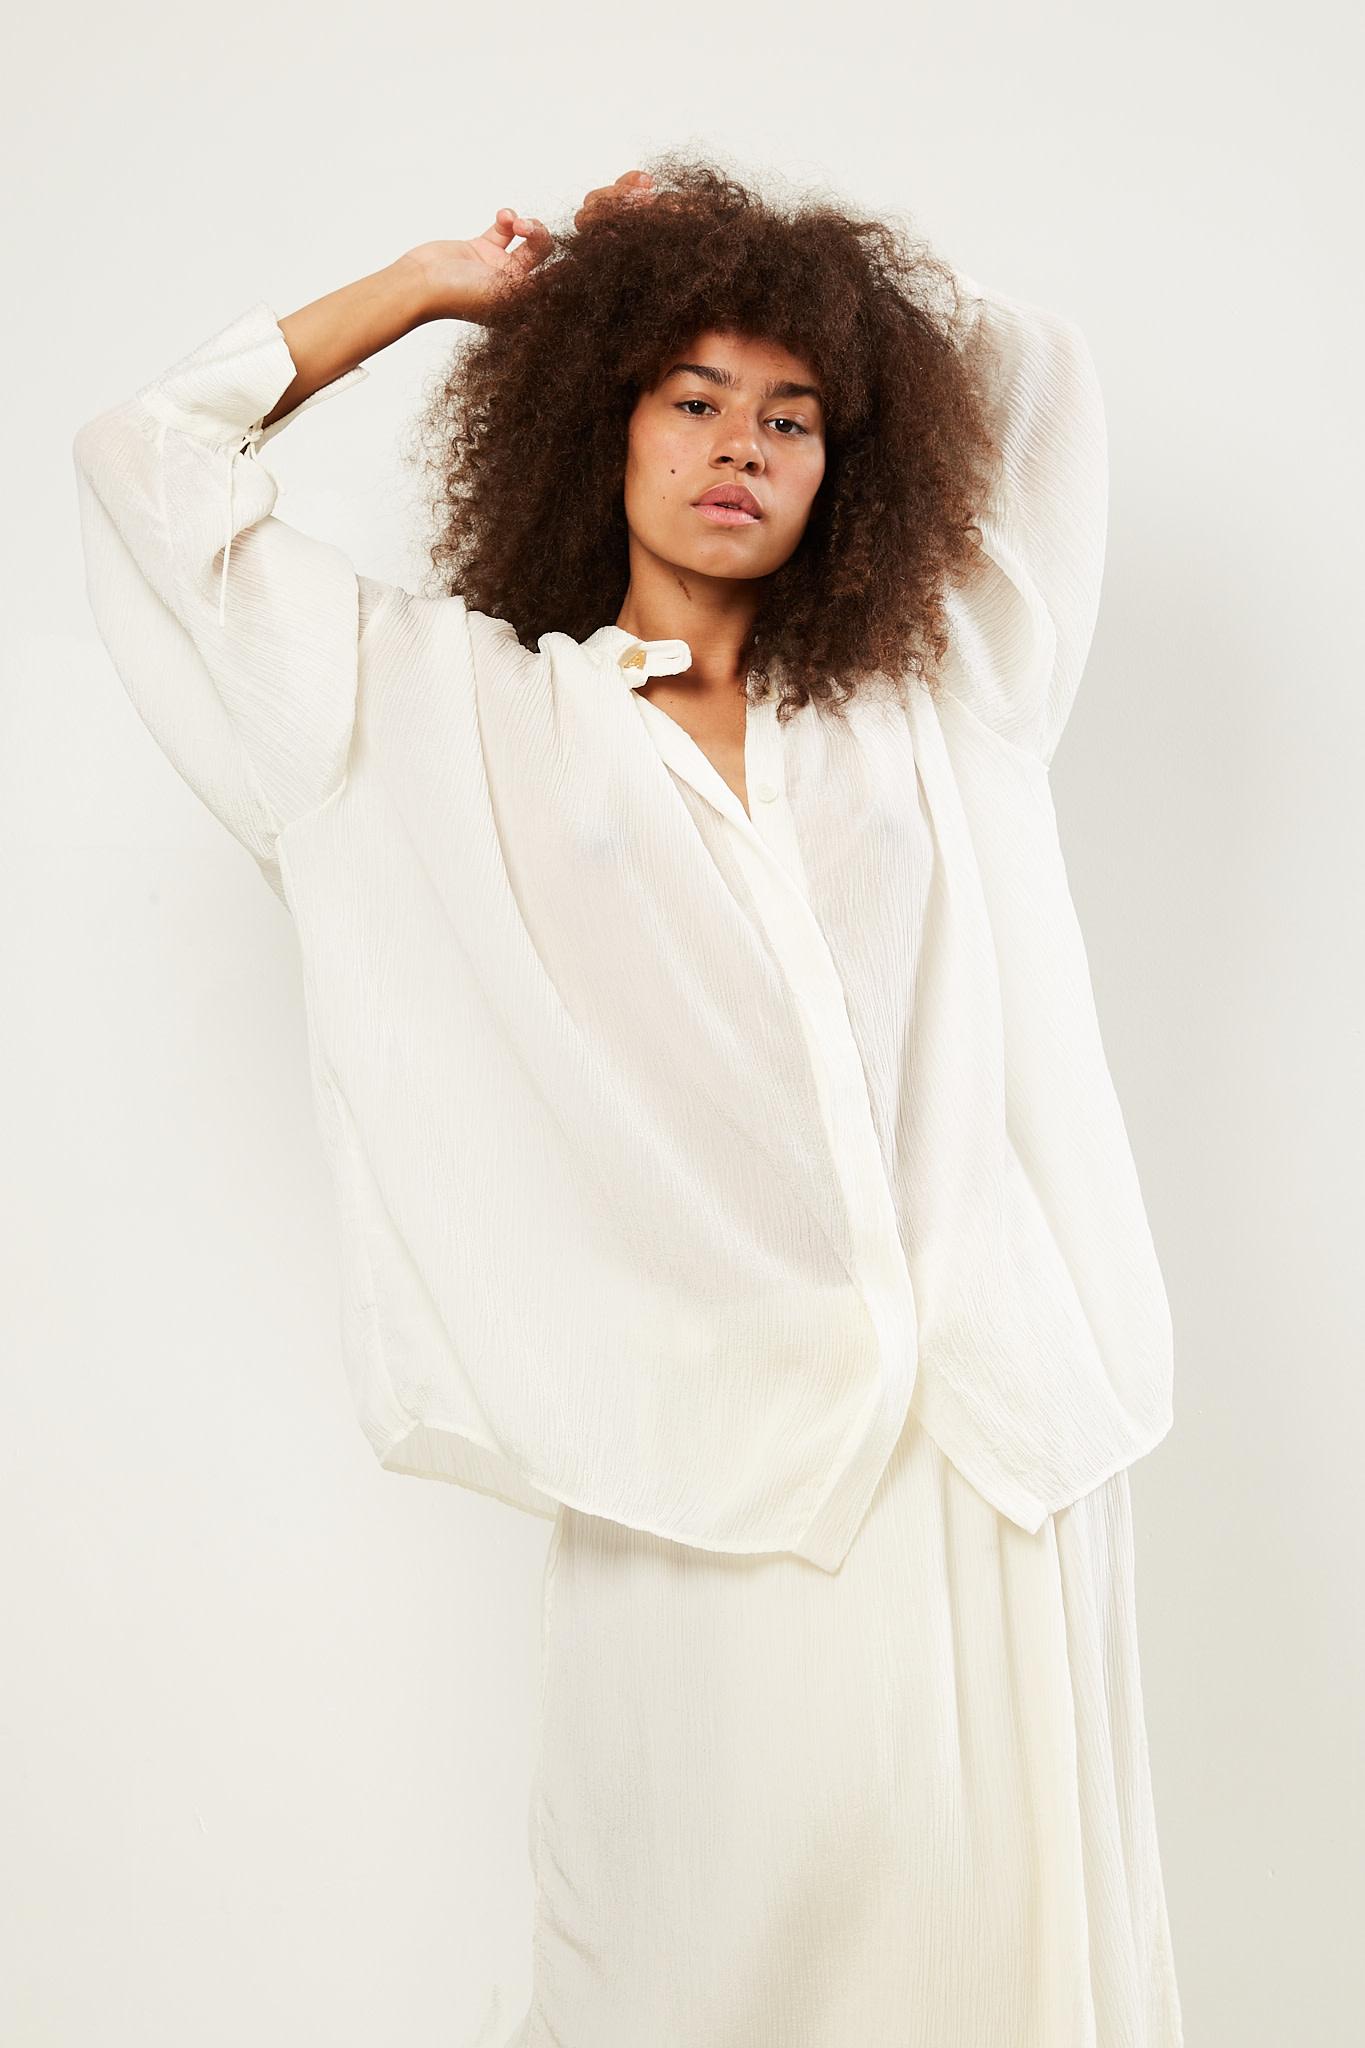 Aeron - Bombay silk blend shirt